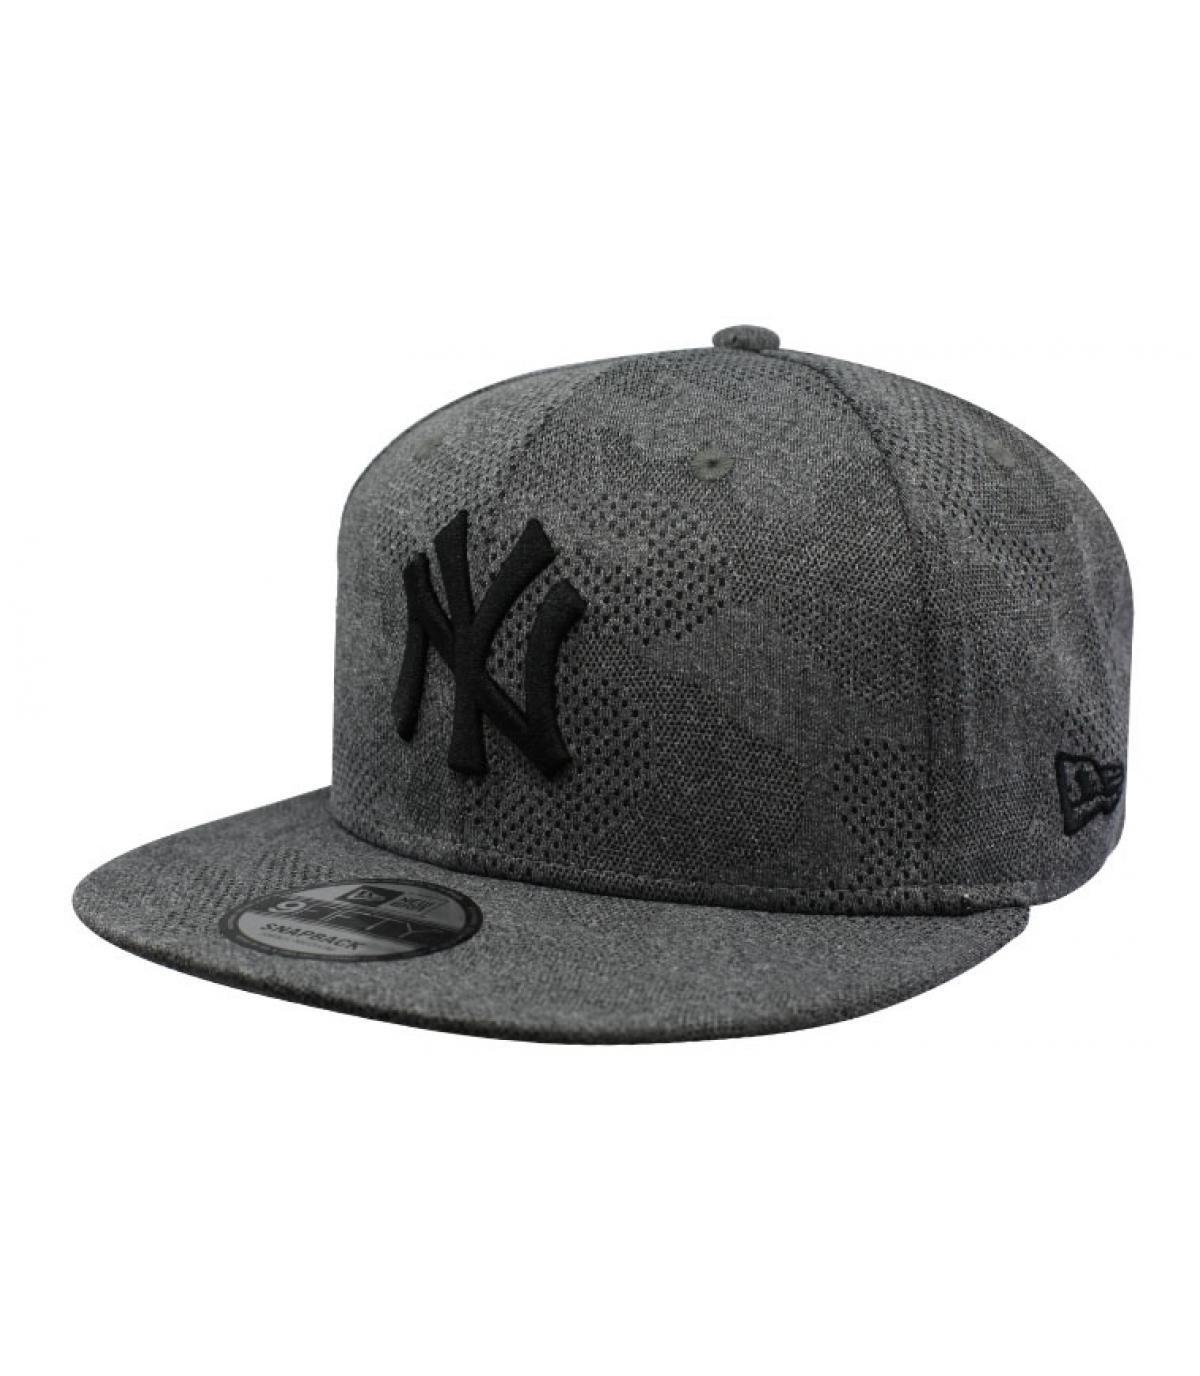 Details Snapback Engineered Plus NY 950 gray black - Abbildung 2